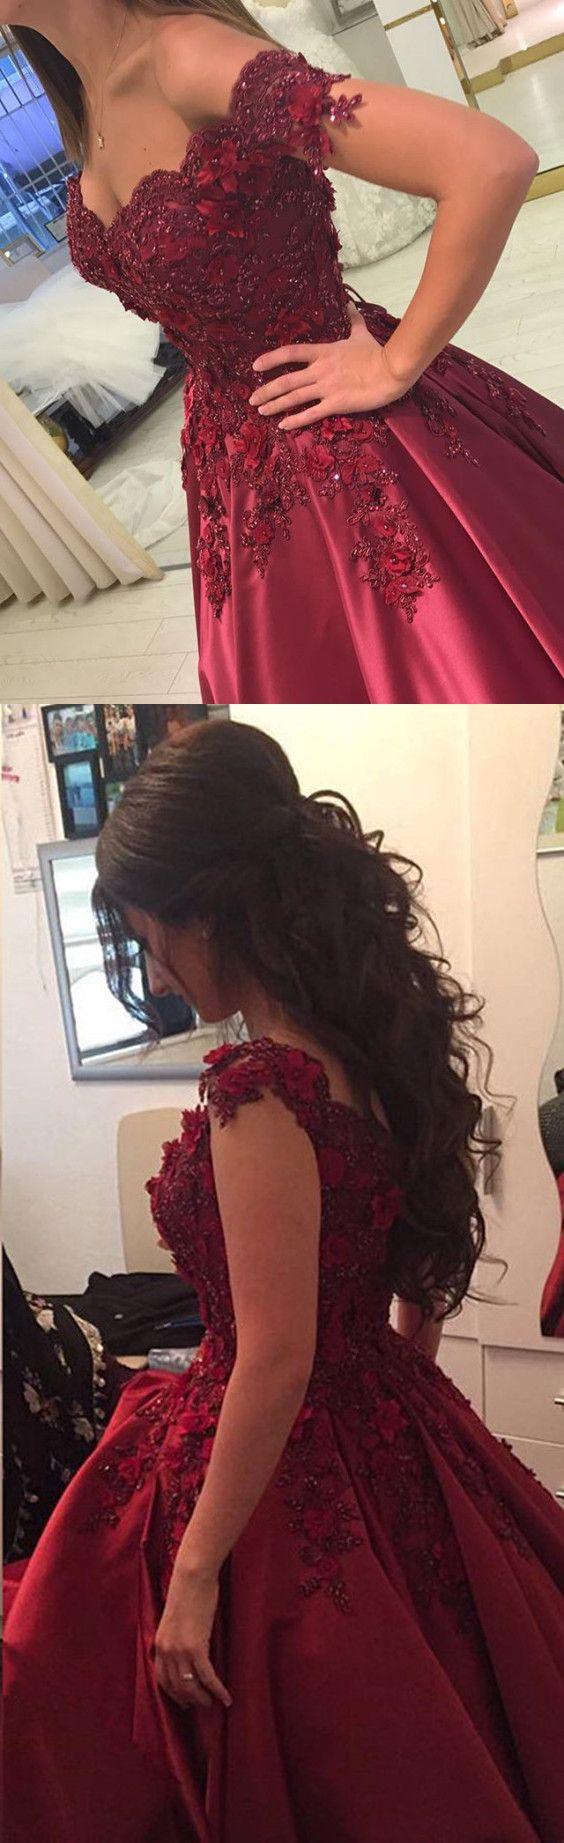 maroon prom dress,ball gowns prom dress,ball gown evening dress,satin prom dress,burgundy wedding dress,formal evening dress